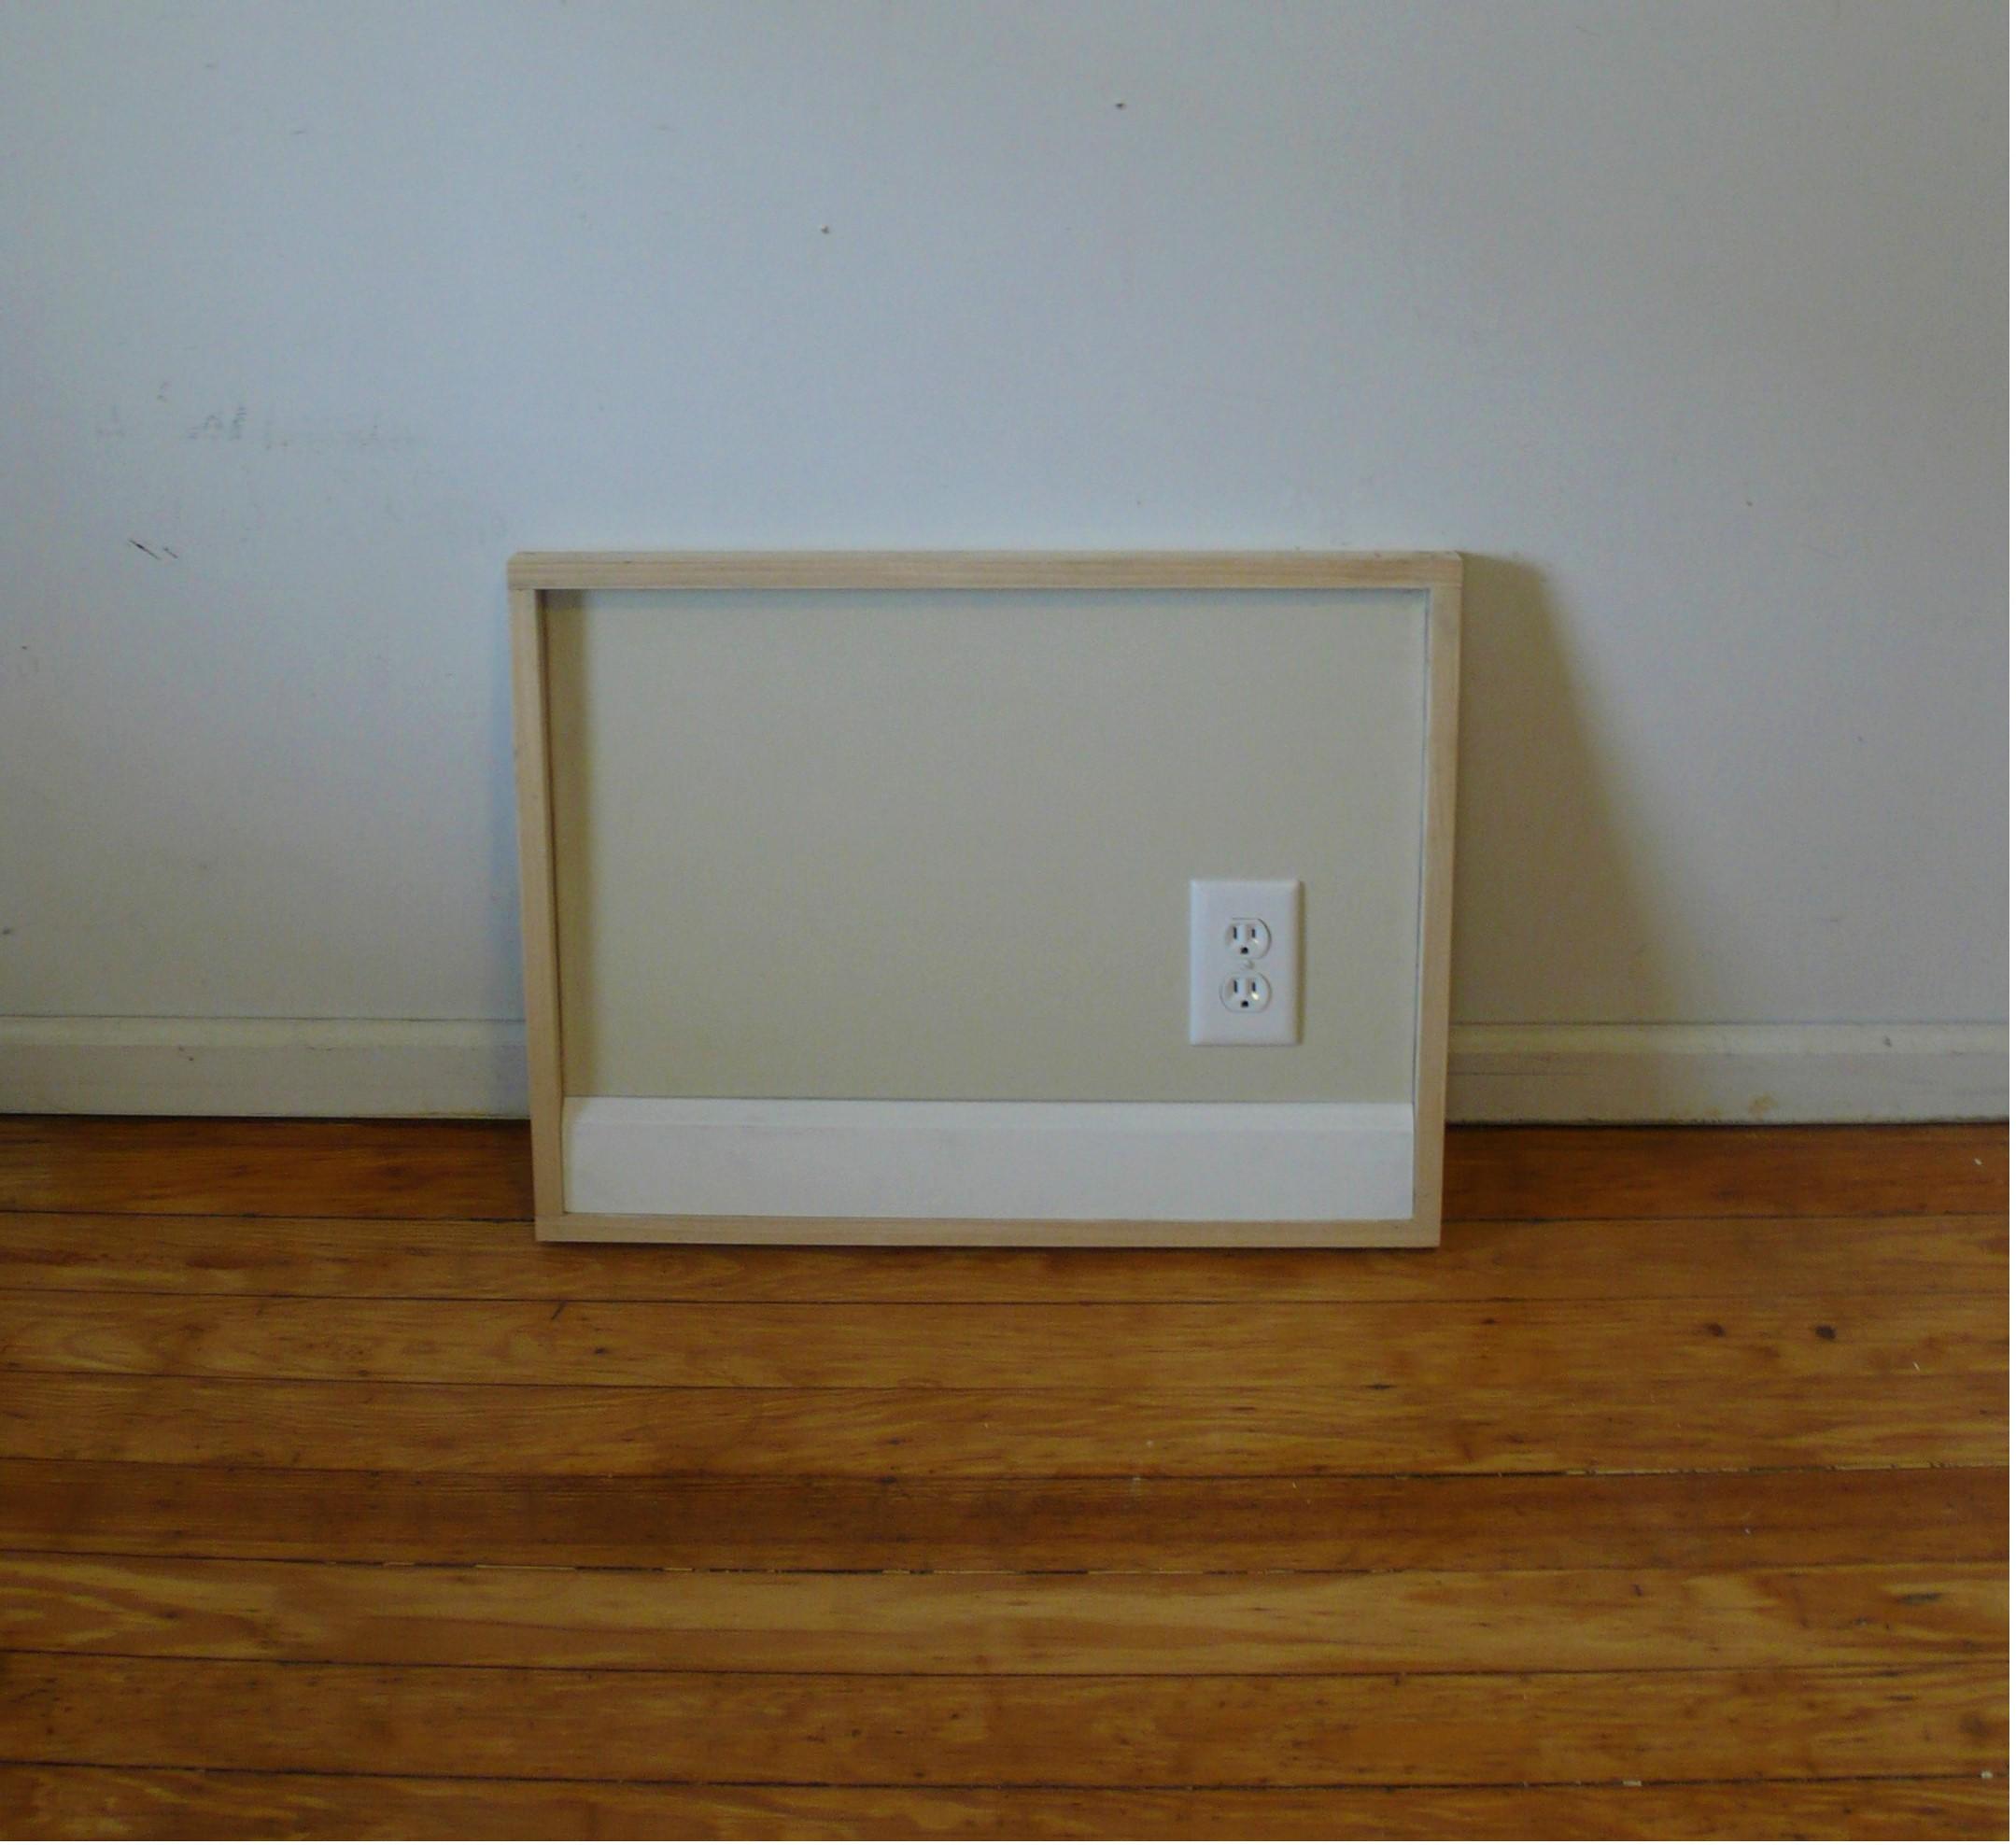 Wall Plug (2) - Copy